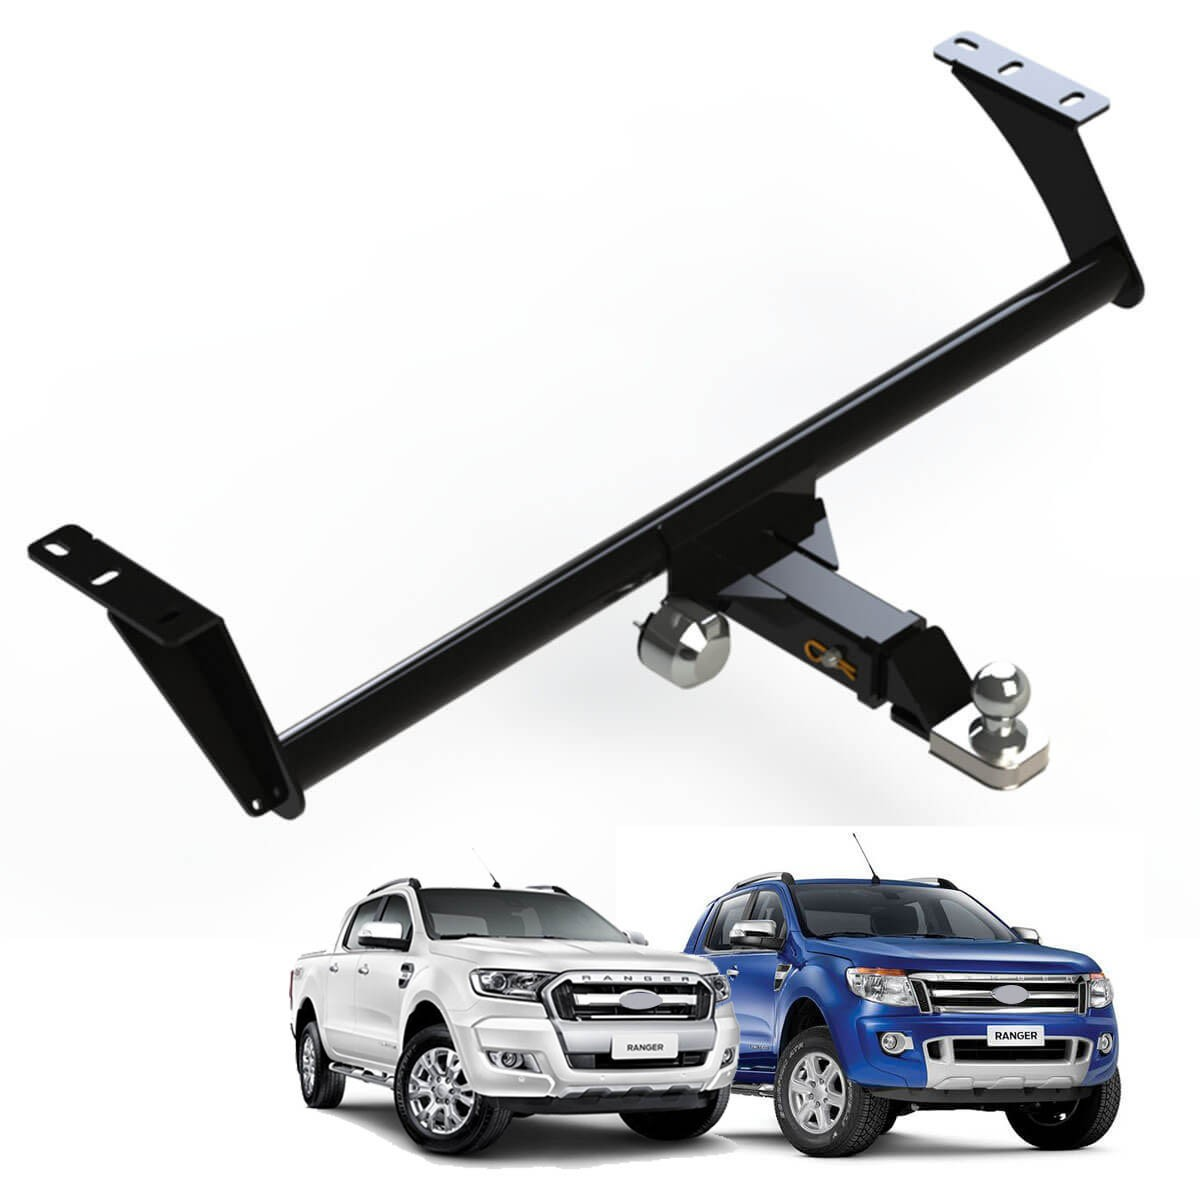 Engate de reboque Nova Ranger 2013 a 2018 removível 1500 Kg